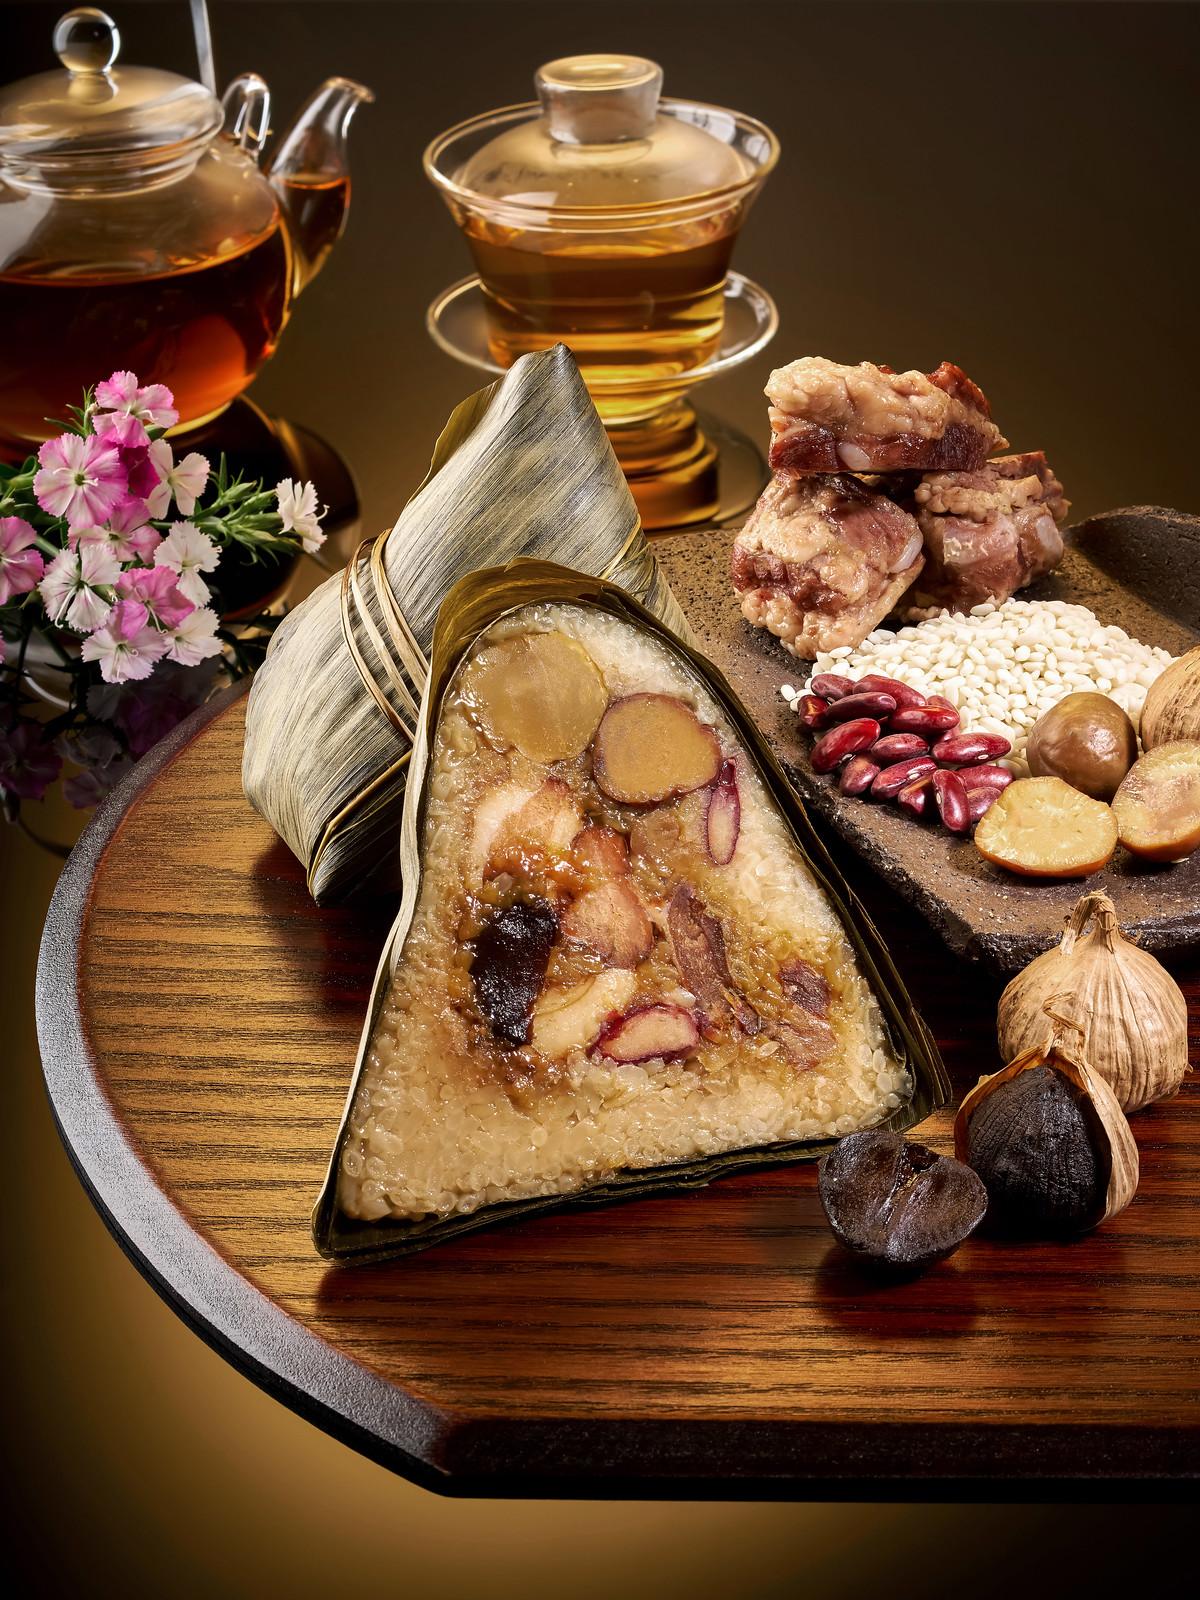 Wan Hao Chinese Restaurant_Kurobuta Pork, Chestnut, Black Garlic Rice Dumpling